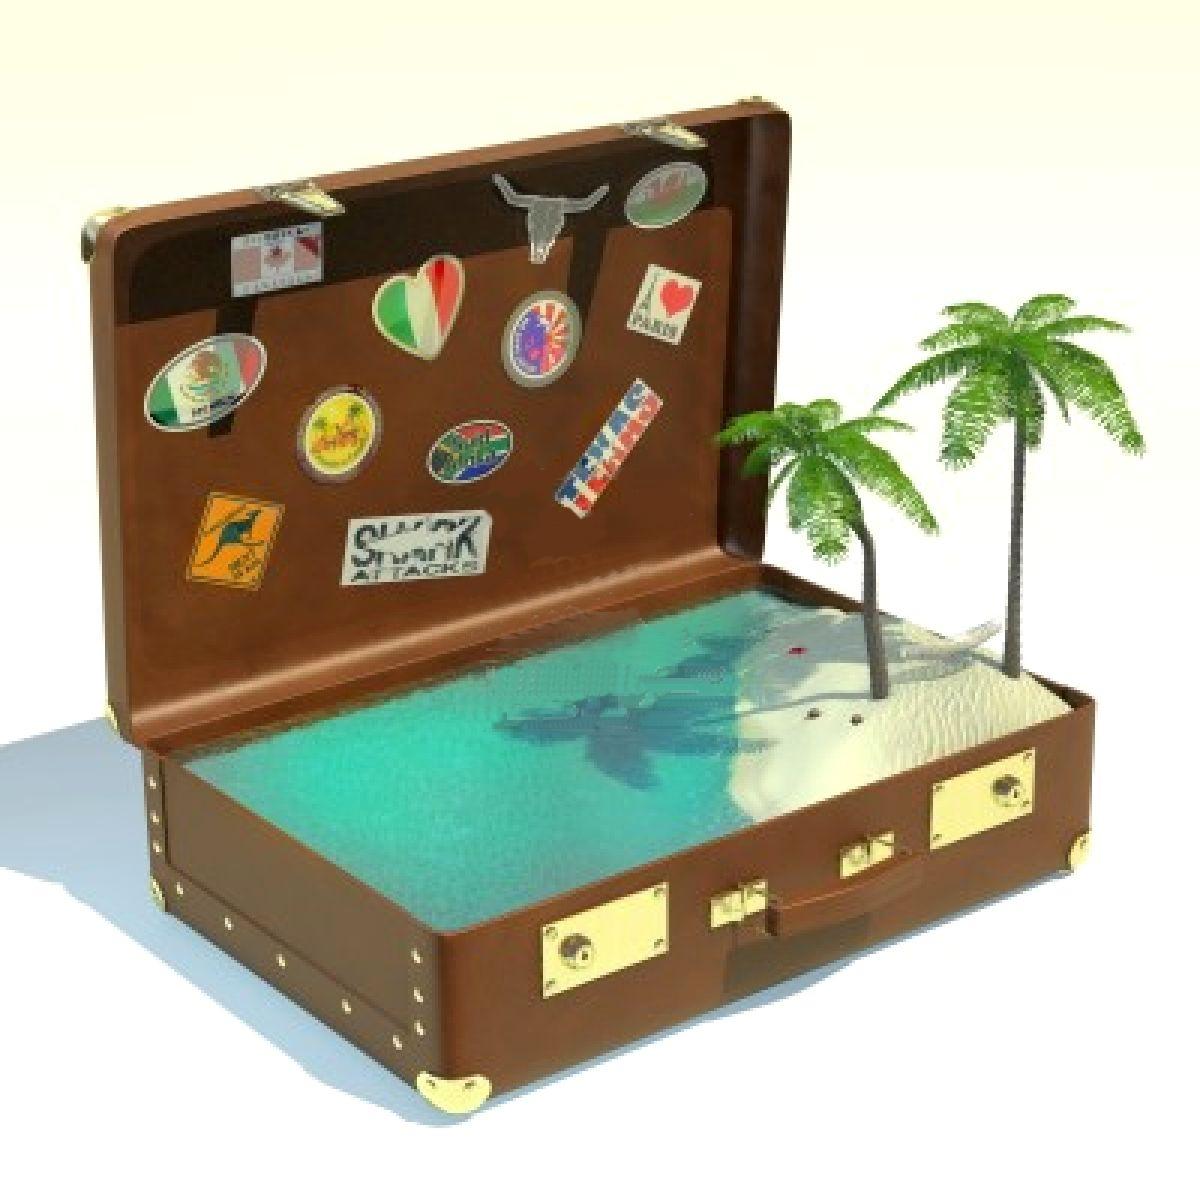 9626564-representaci-n-3d-de-muy-alta-resoluci-n-de-una-maleta-antigua-con-un-paisaje-tropical-dentro-de